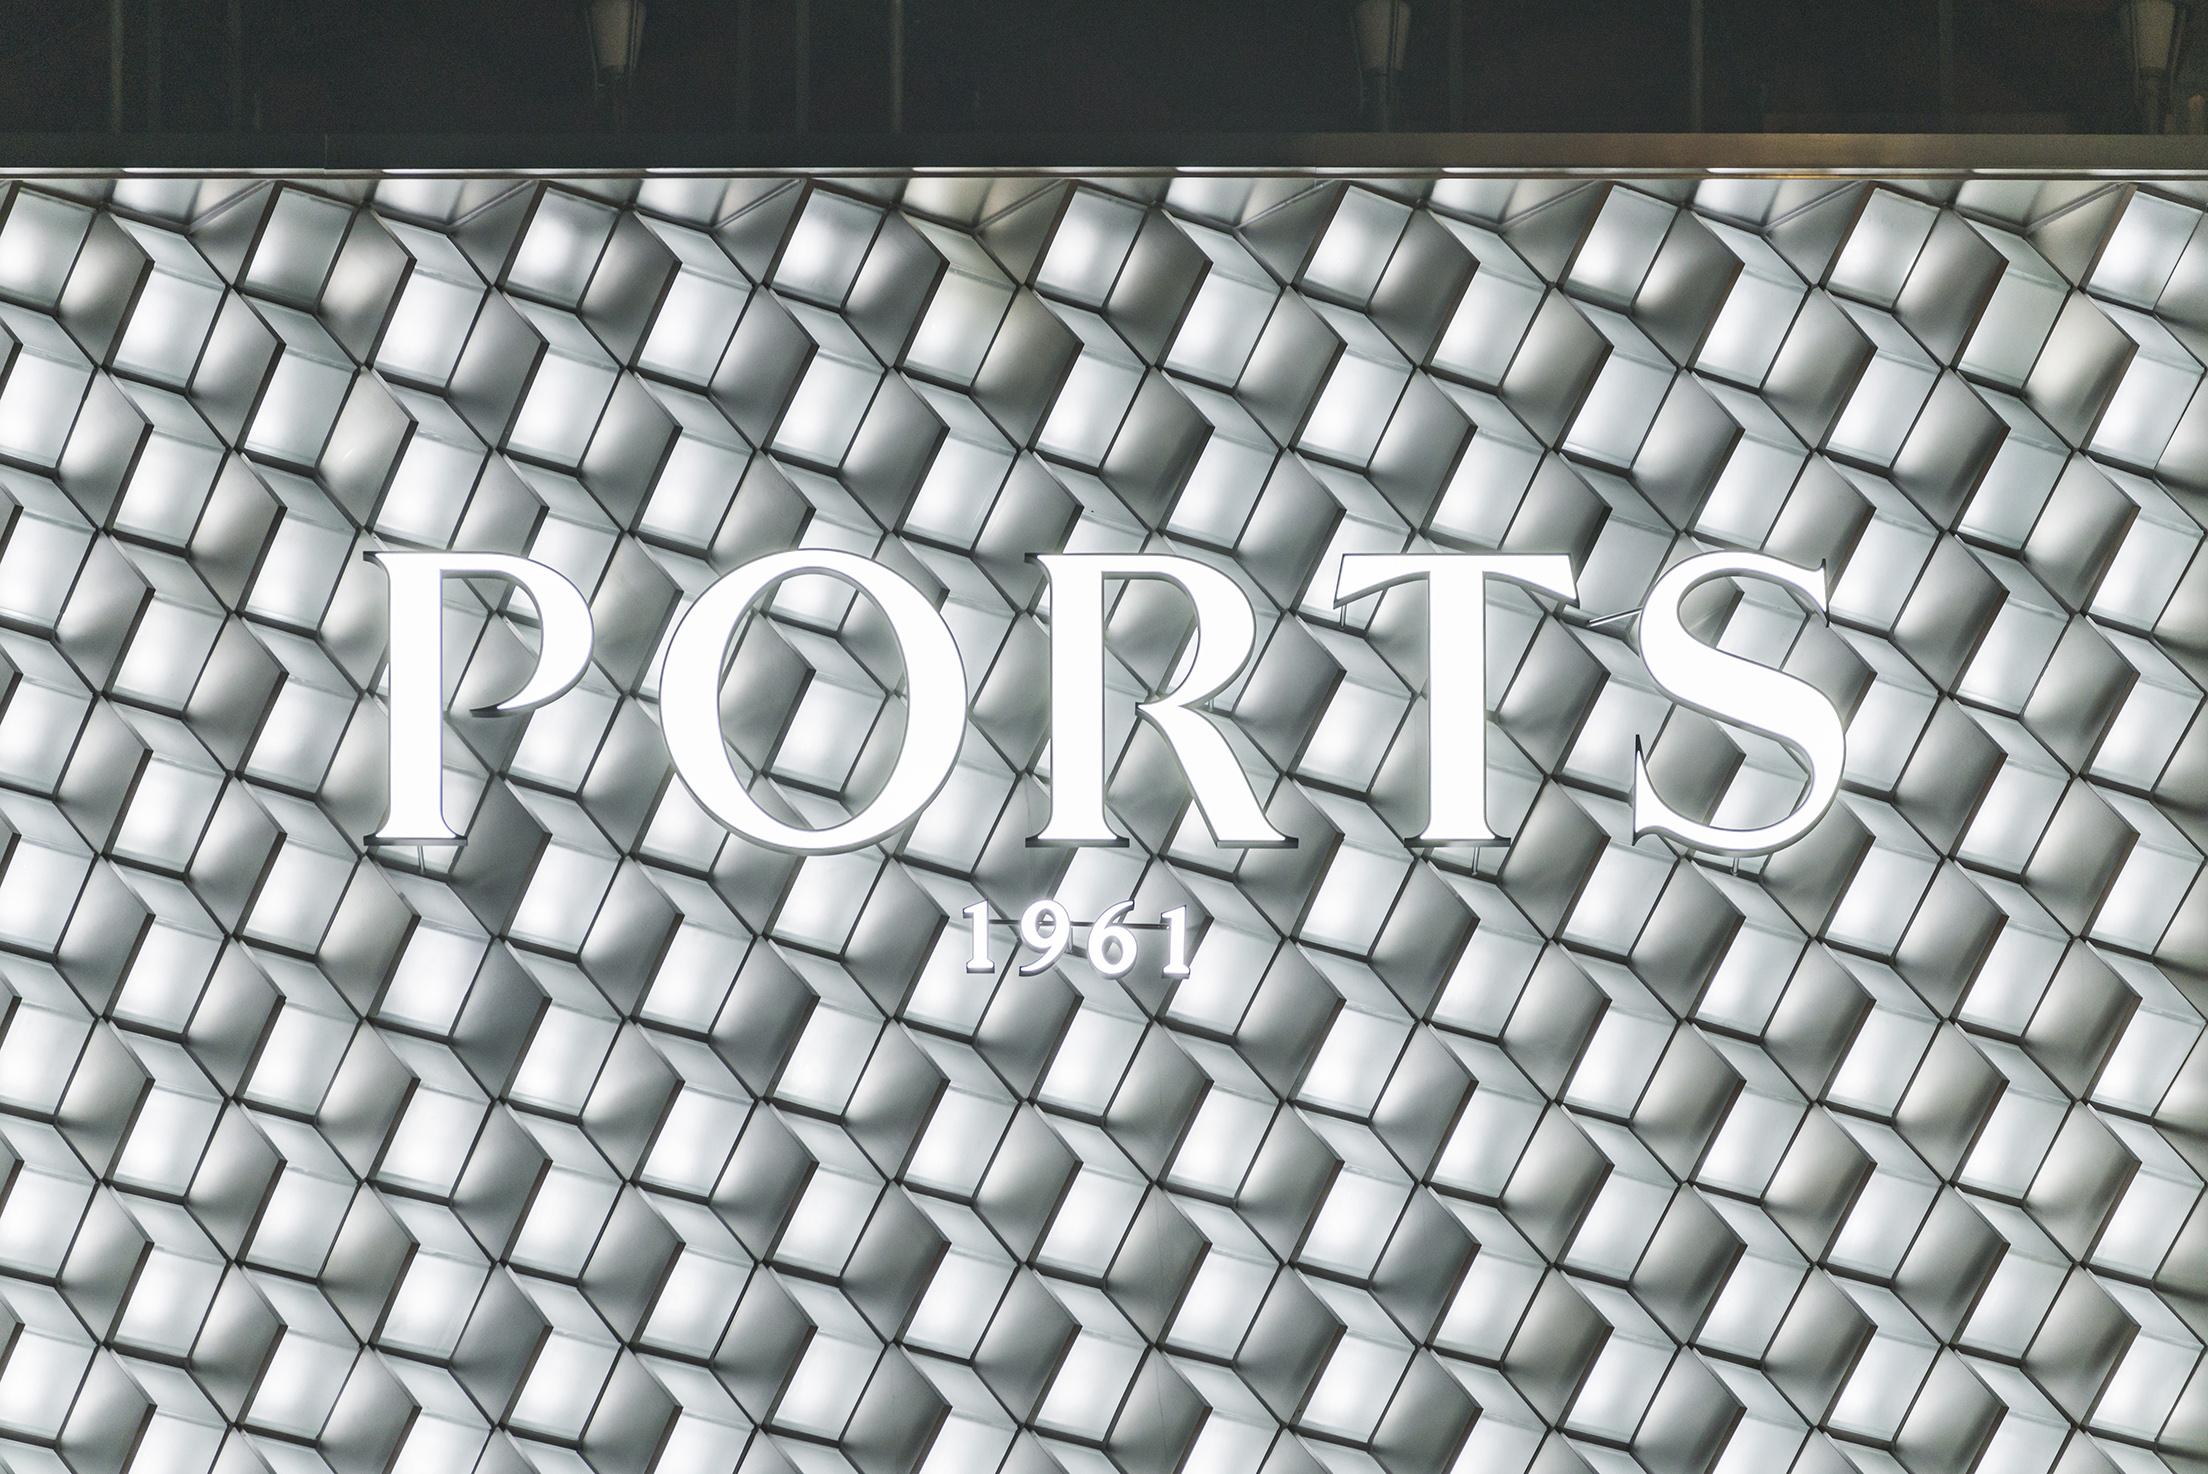 JEB_customprojects_facades_ports_HK_retail_6b.jpg